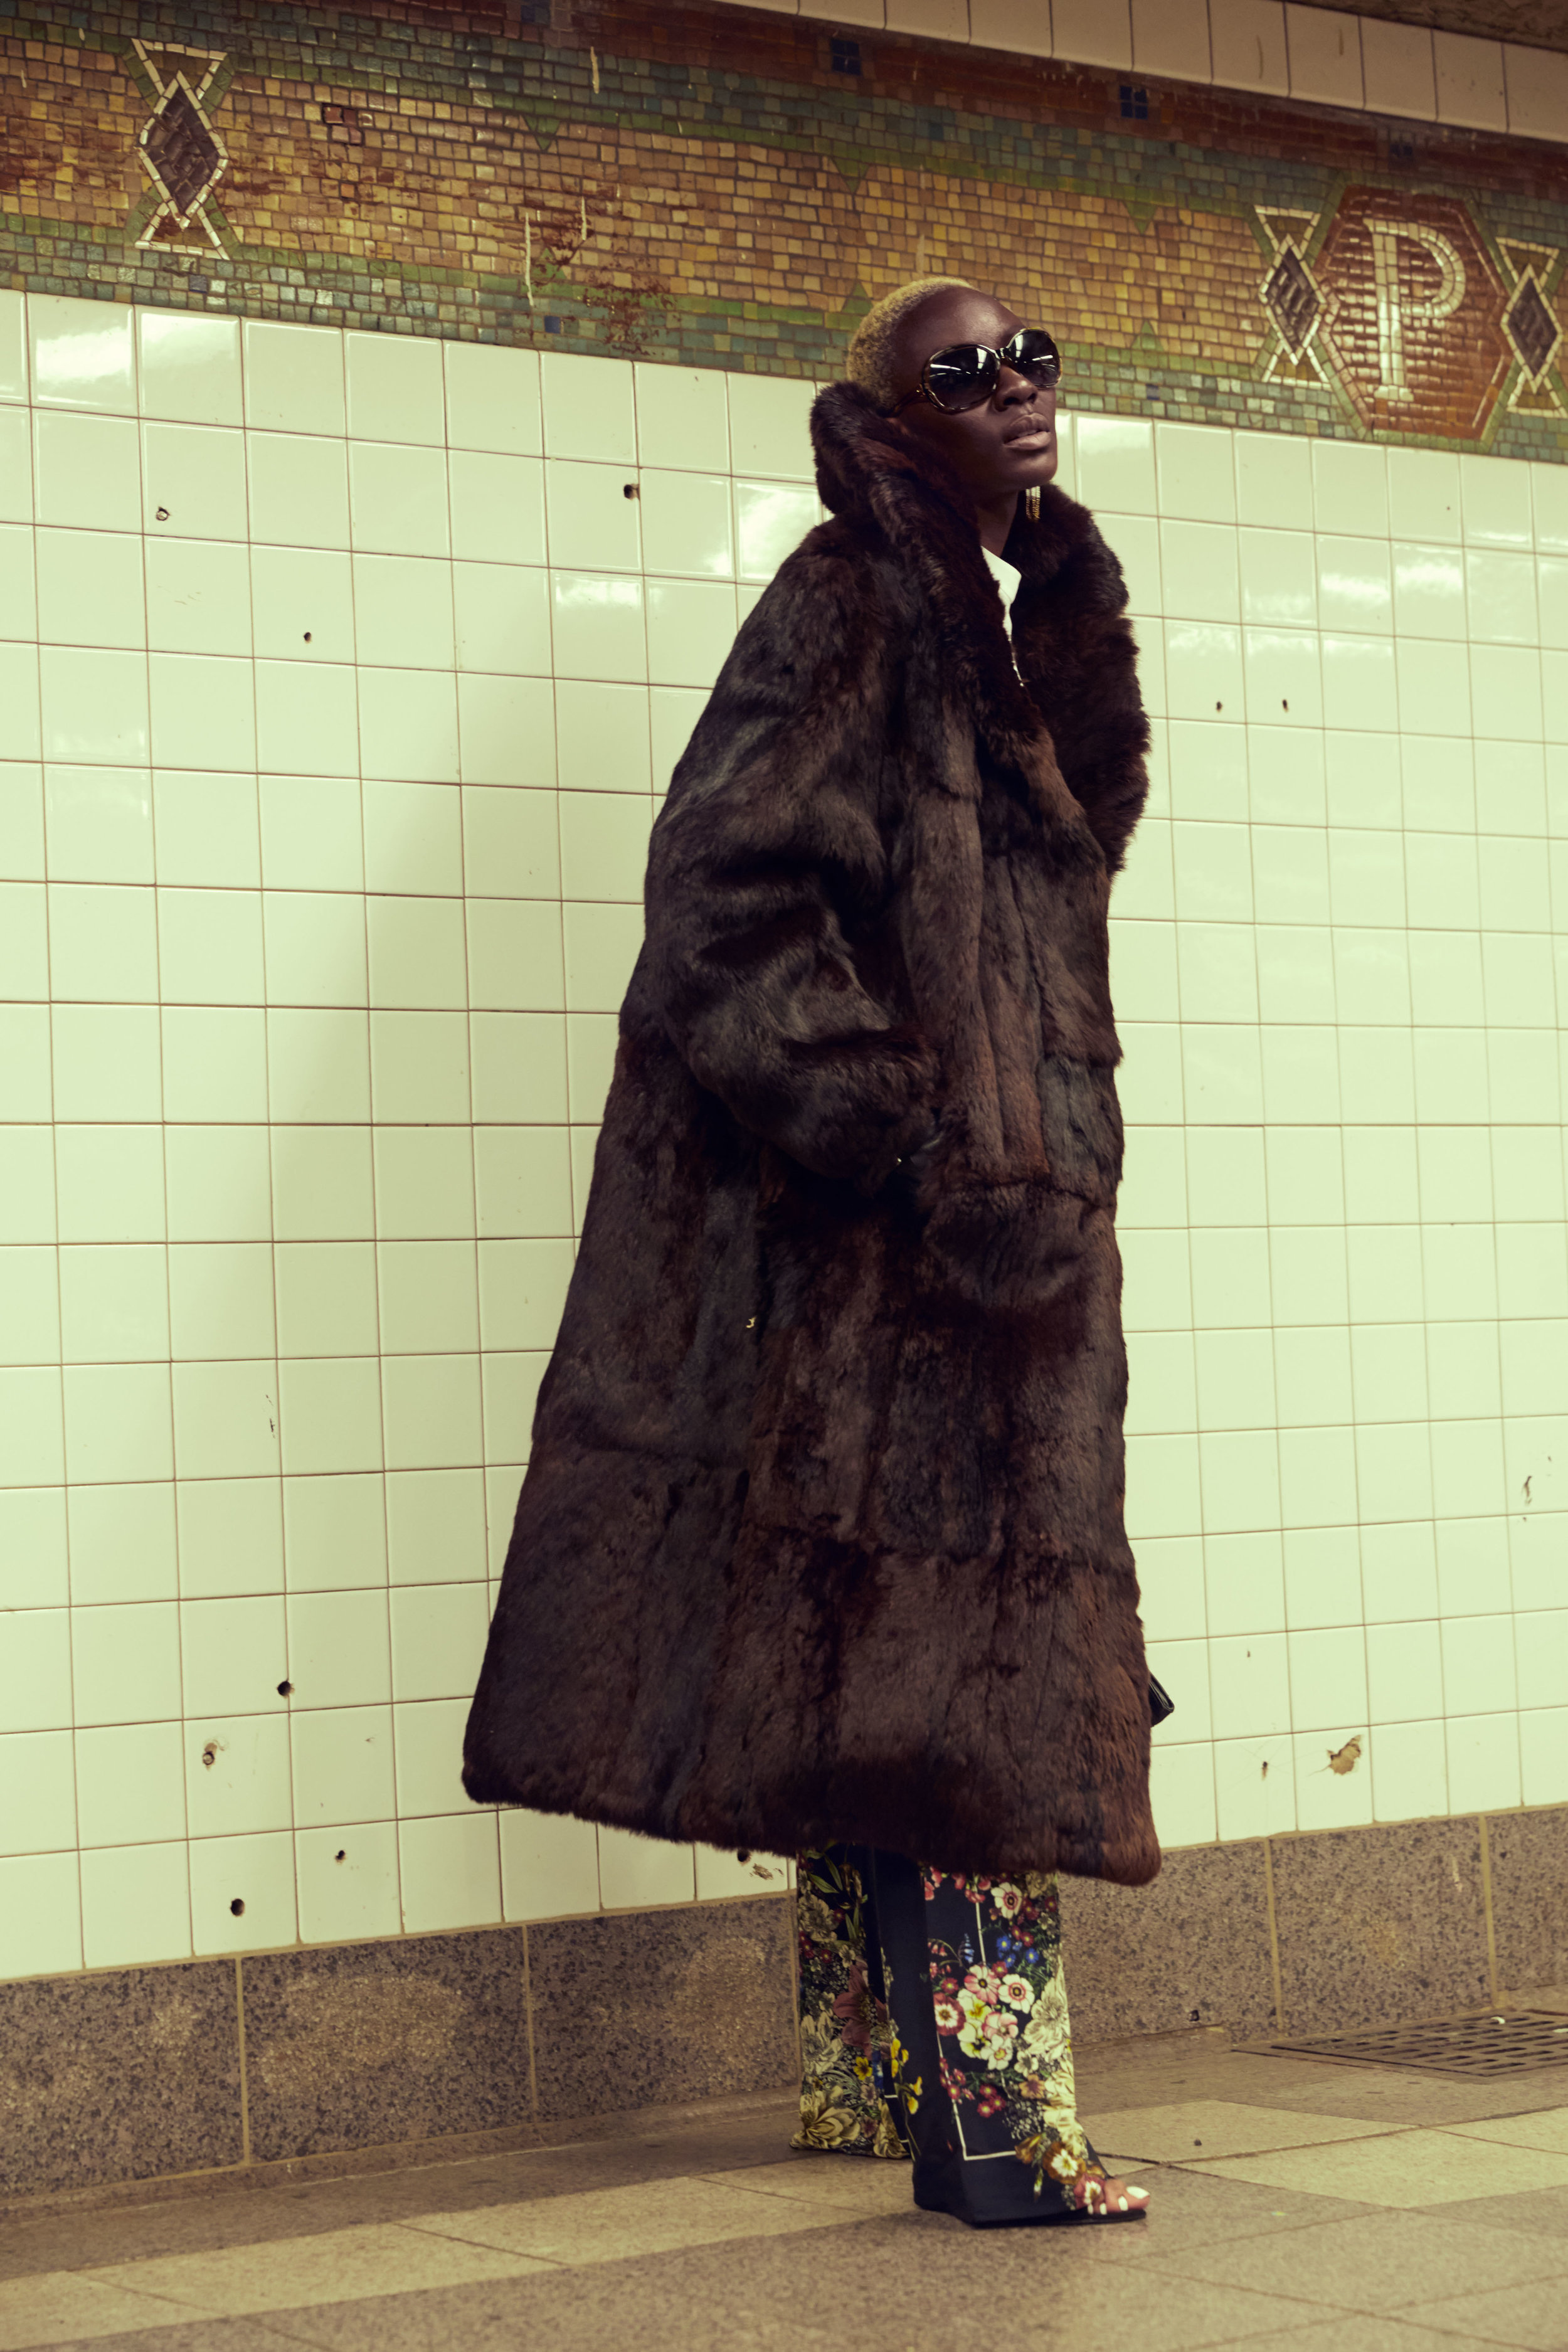 Coat: Henig Furs by Quantaj  Top: BCBG Max Azria  Pants: Zara  Shoes: Steve Madden  Gloves: Catherine's  Shades: Vintage  Earrings: Erica Lyons  Purse: Sondra Roberts